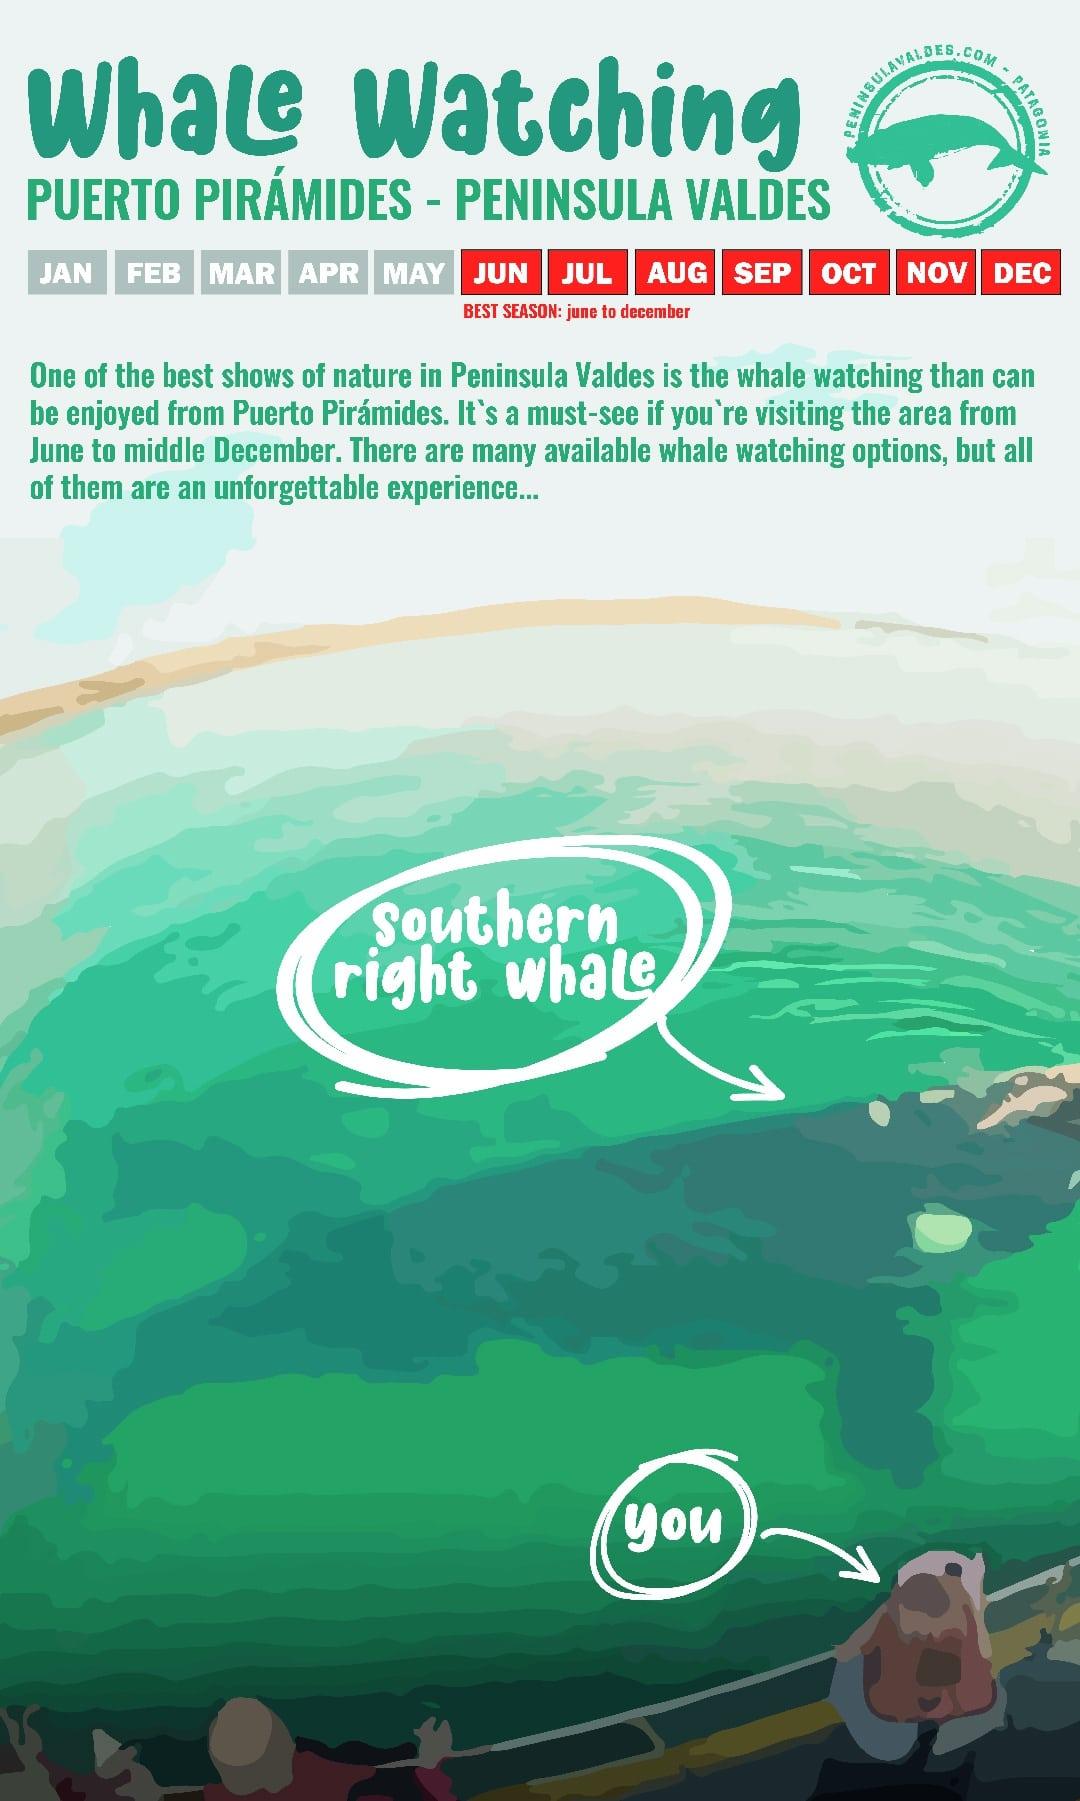 Whale Watching Activity in Peninsula Valdes, Patagonia, Argentina - RipioTurismo DMC for Argentina